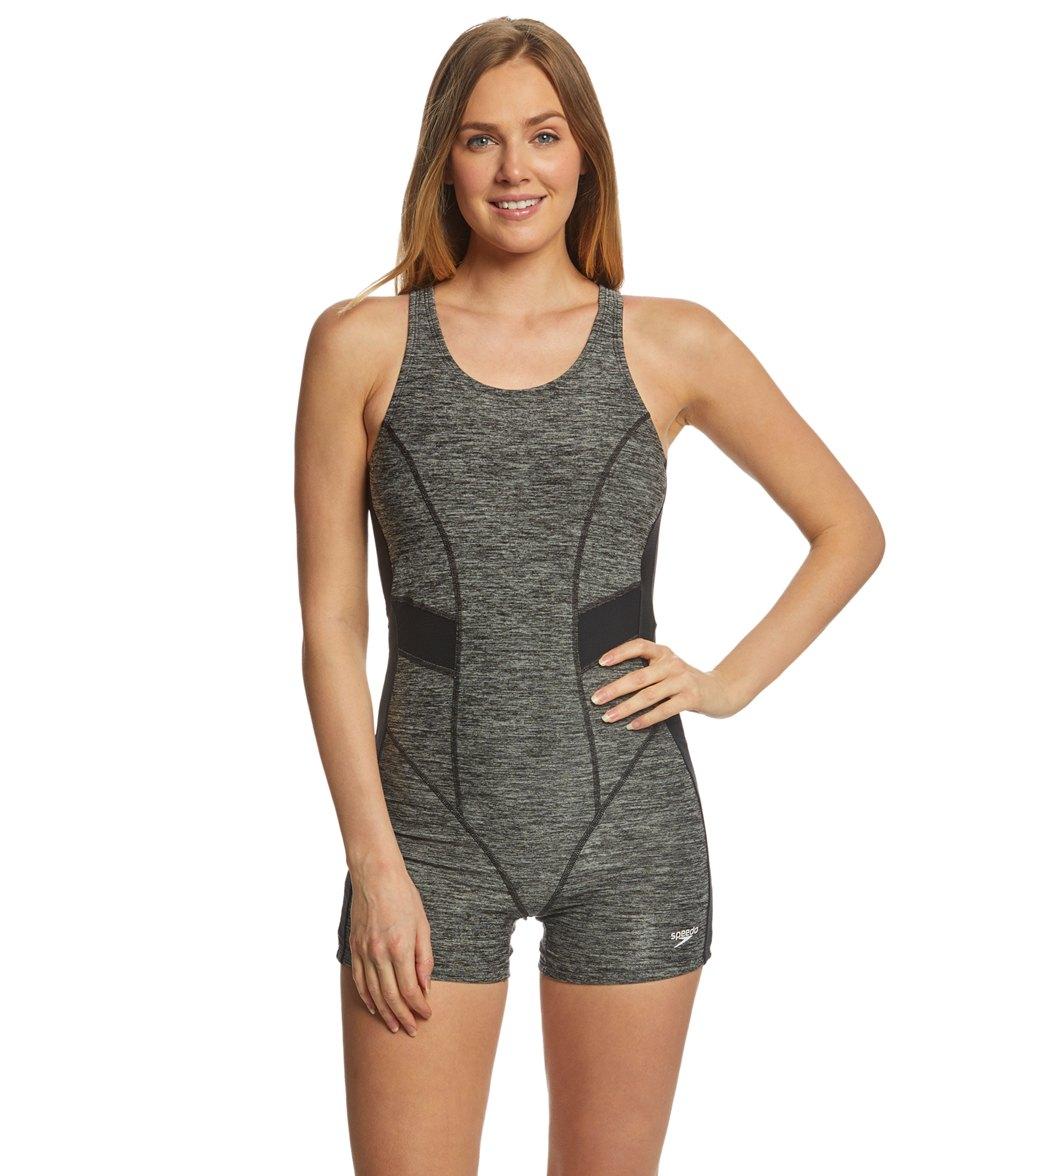 Speedo Women s Heather Bodysuit Swimsuit at SwimOutlet.com - Free Shipping 061d76478